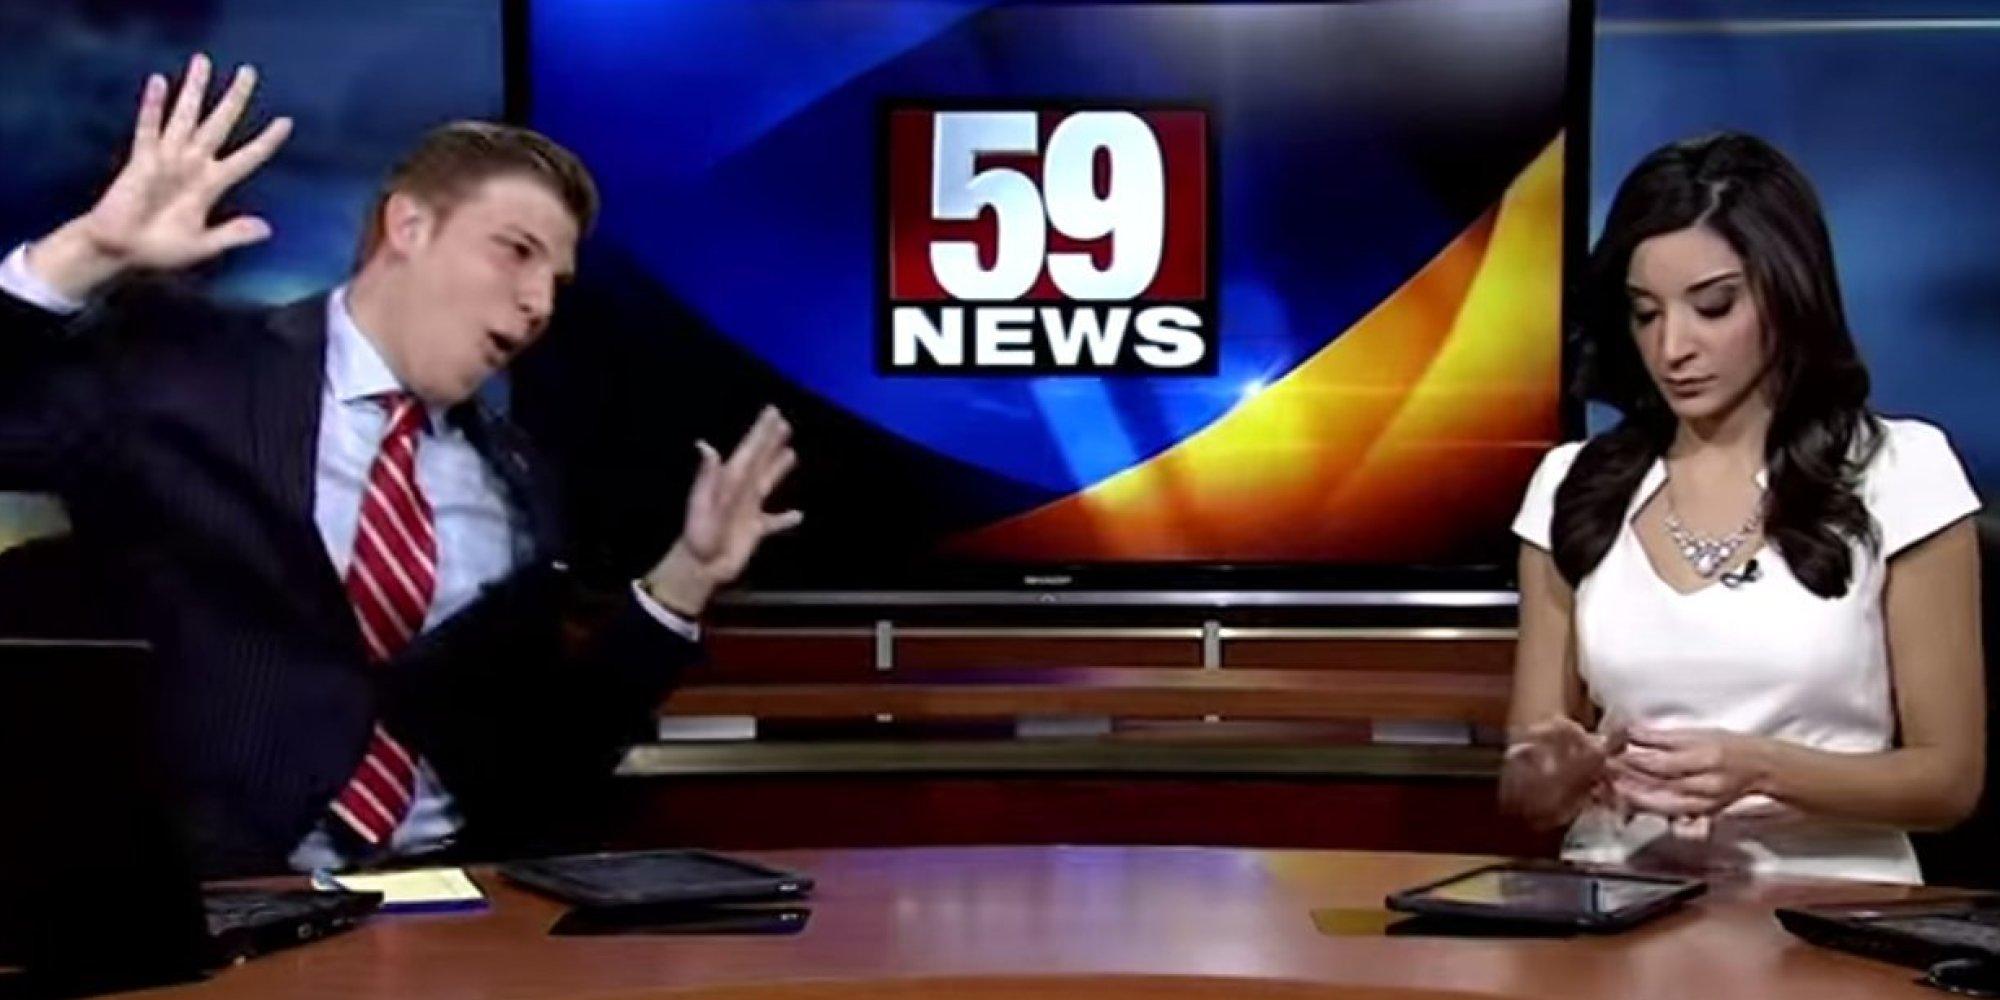 Dan thorn dancer news anchor dating 6